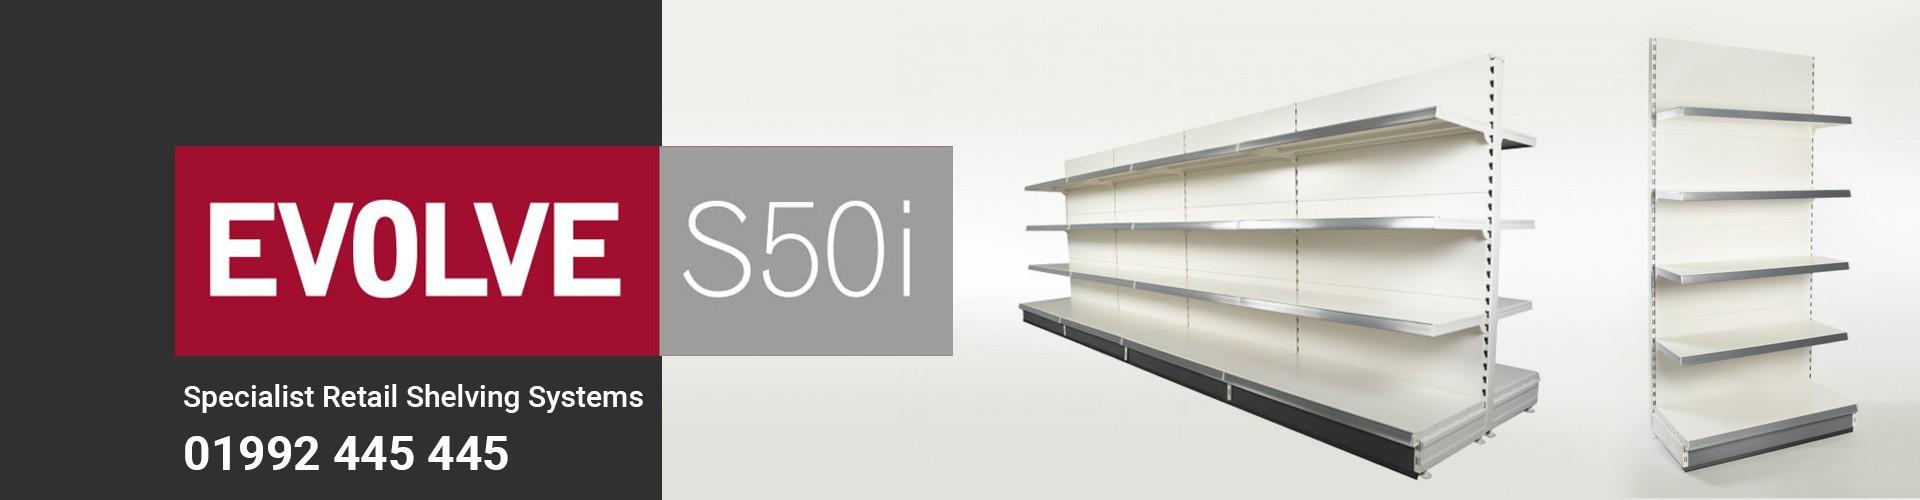 s50i_w_number2